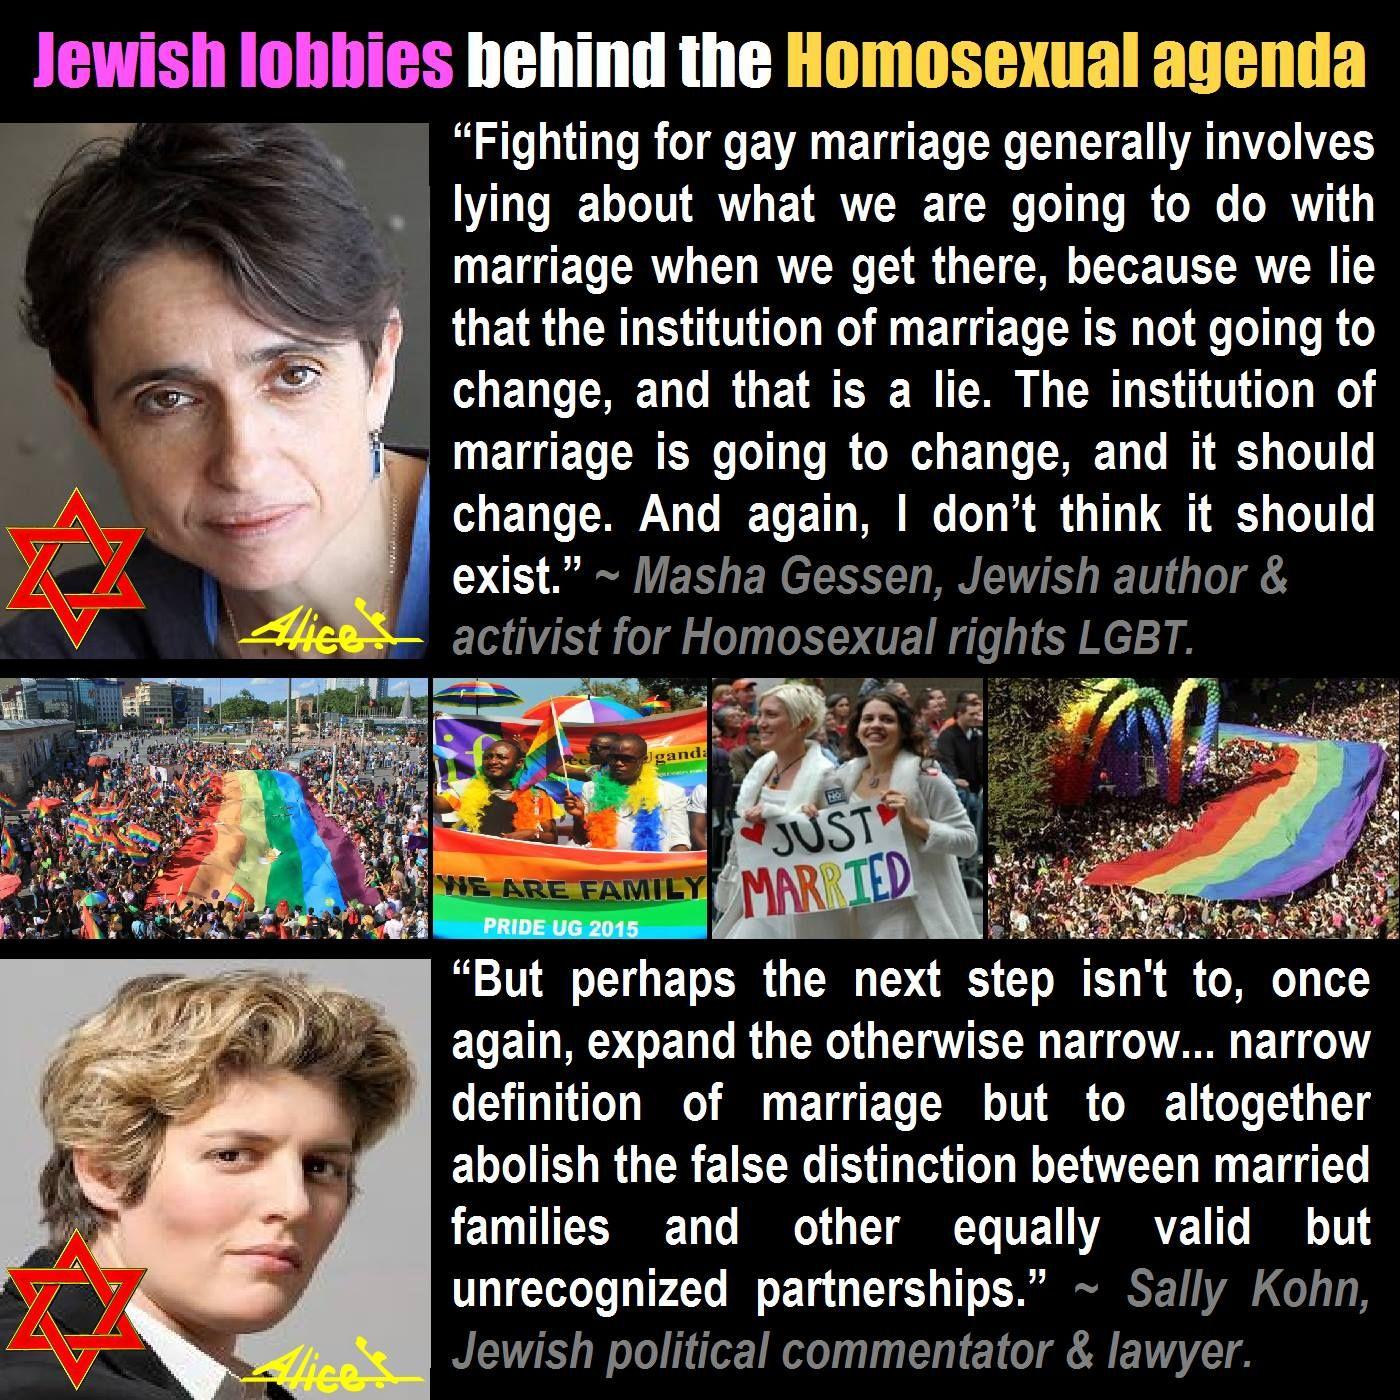 Satanic homosexual agenda